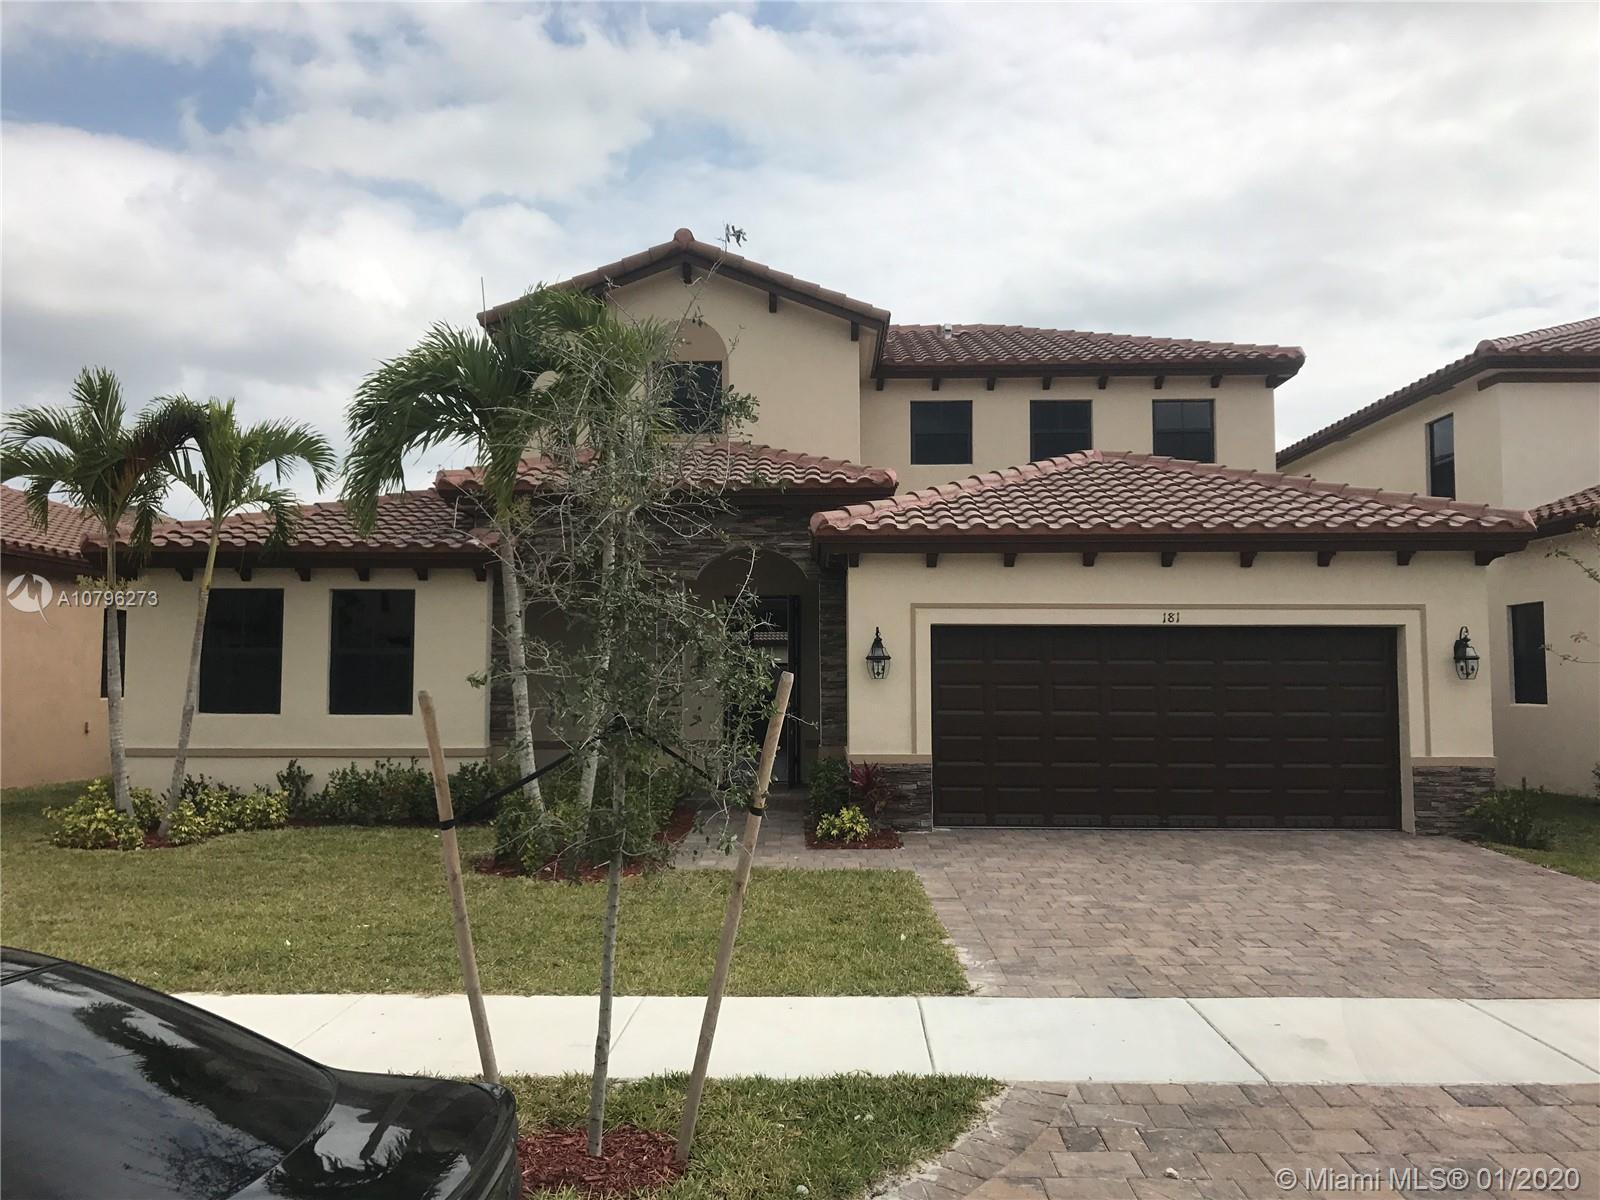 181 SE 35th Ave, Homestead, FL 33033 - Homestead, FL real estate listing